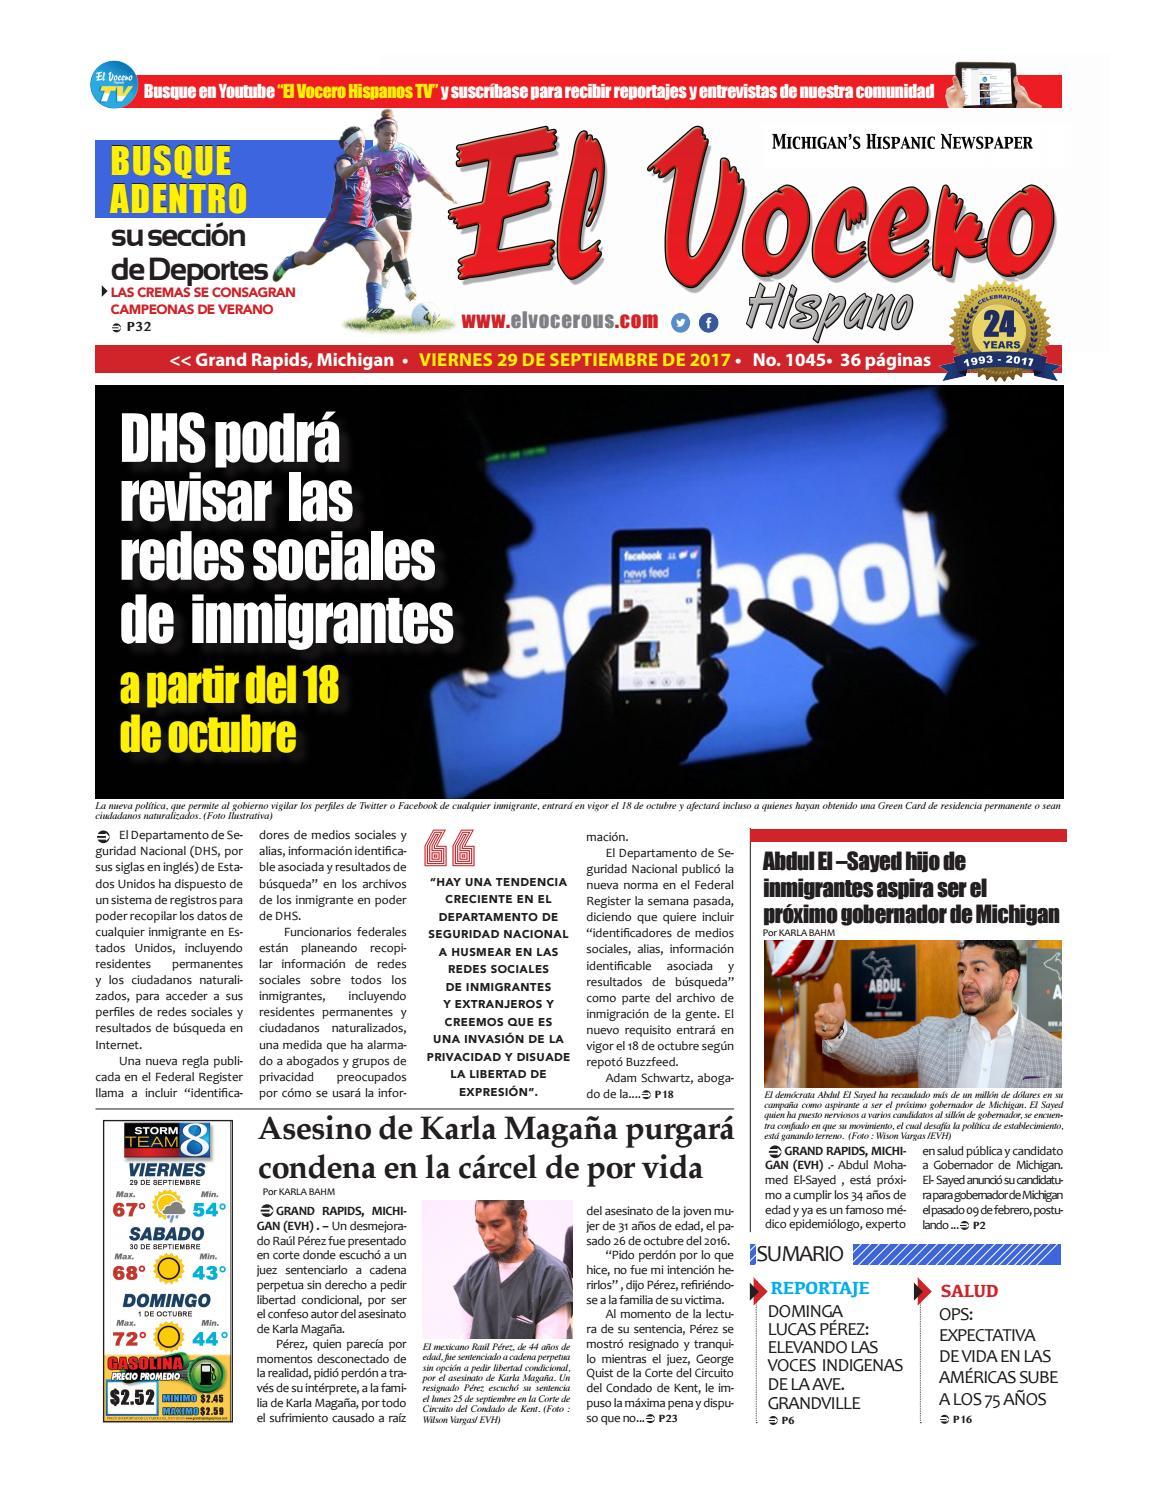 El Vocero Hispano by El Vocero Hispano - issuu